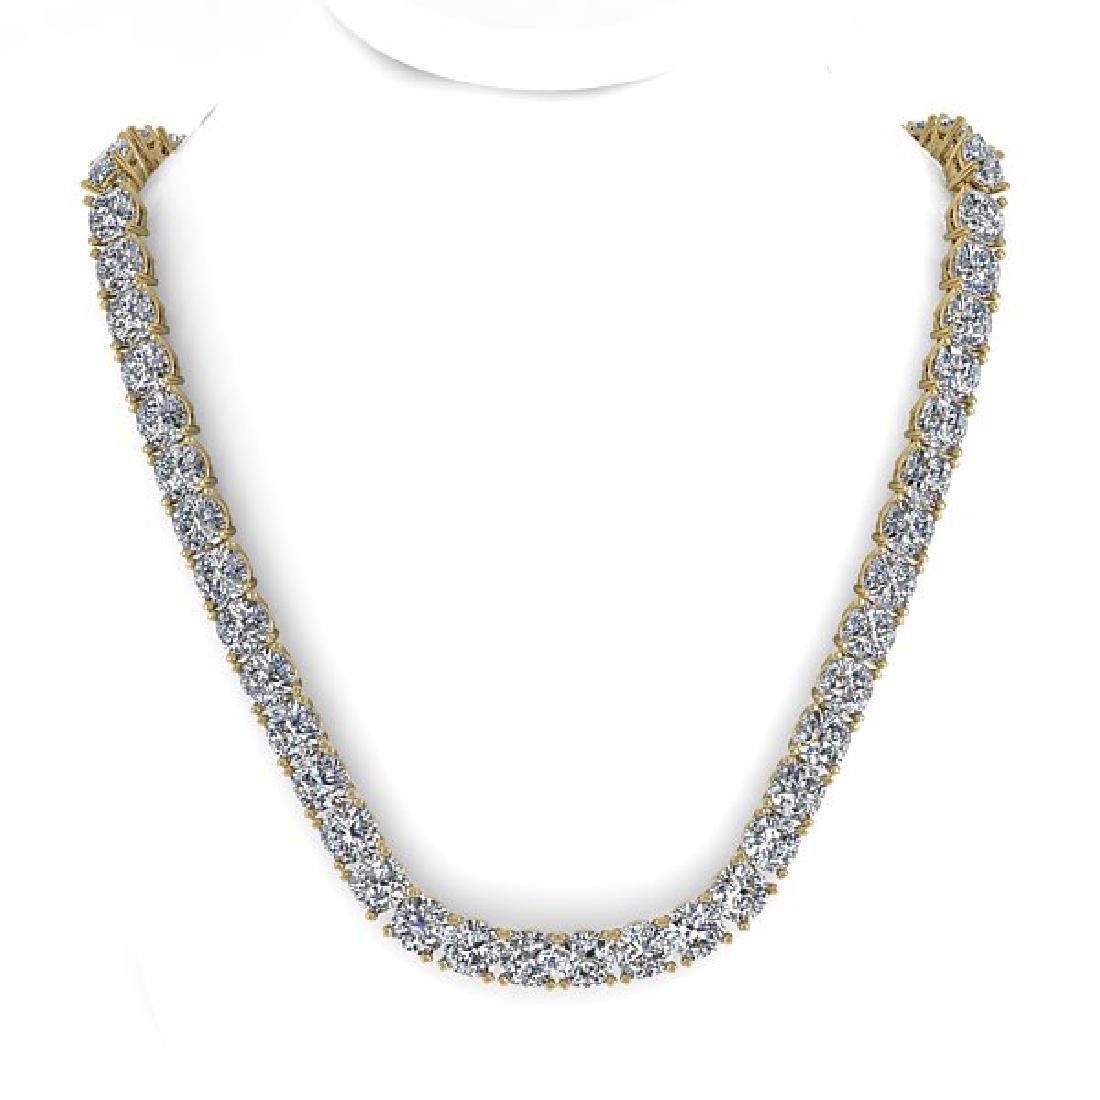 35 CTW Cushion Cut Certified SI Diamond Necklace 14K - 2